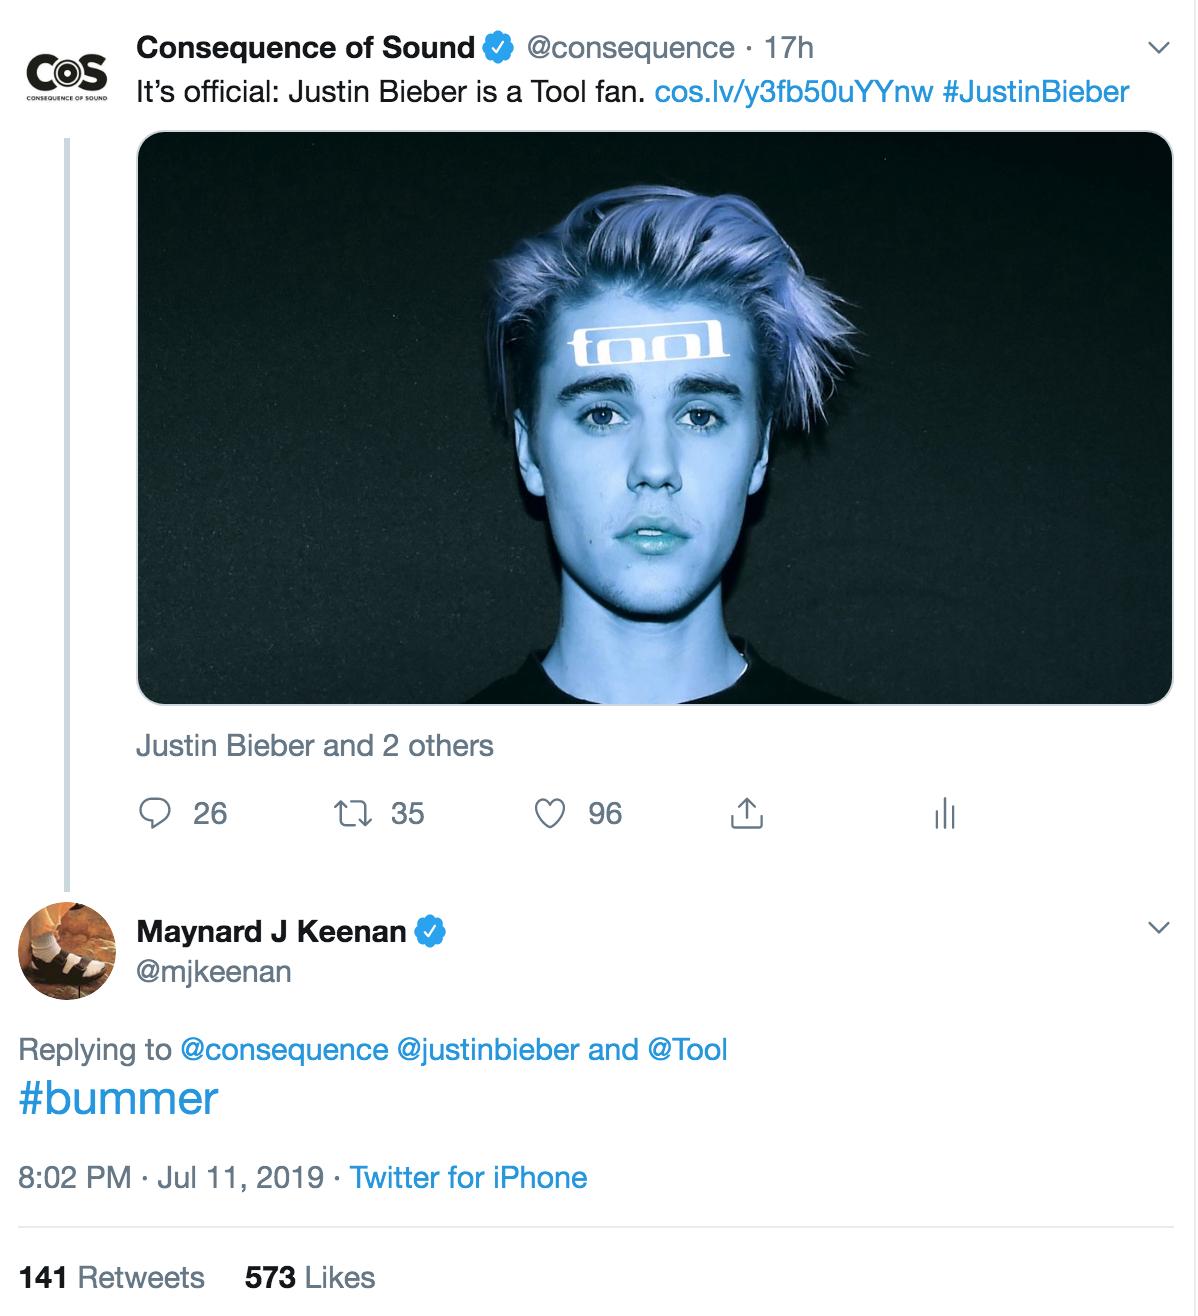 Maynard James Keenan Responds to Justin Bieber's Tool Fandom